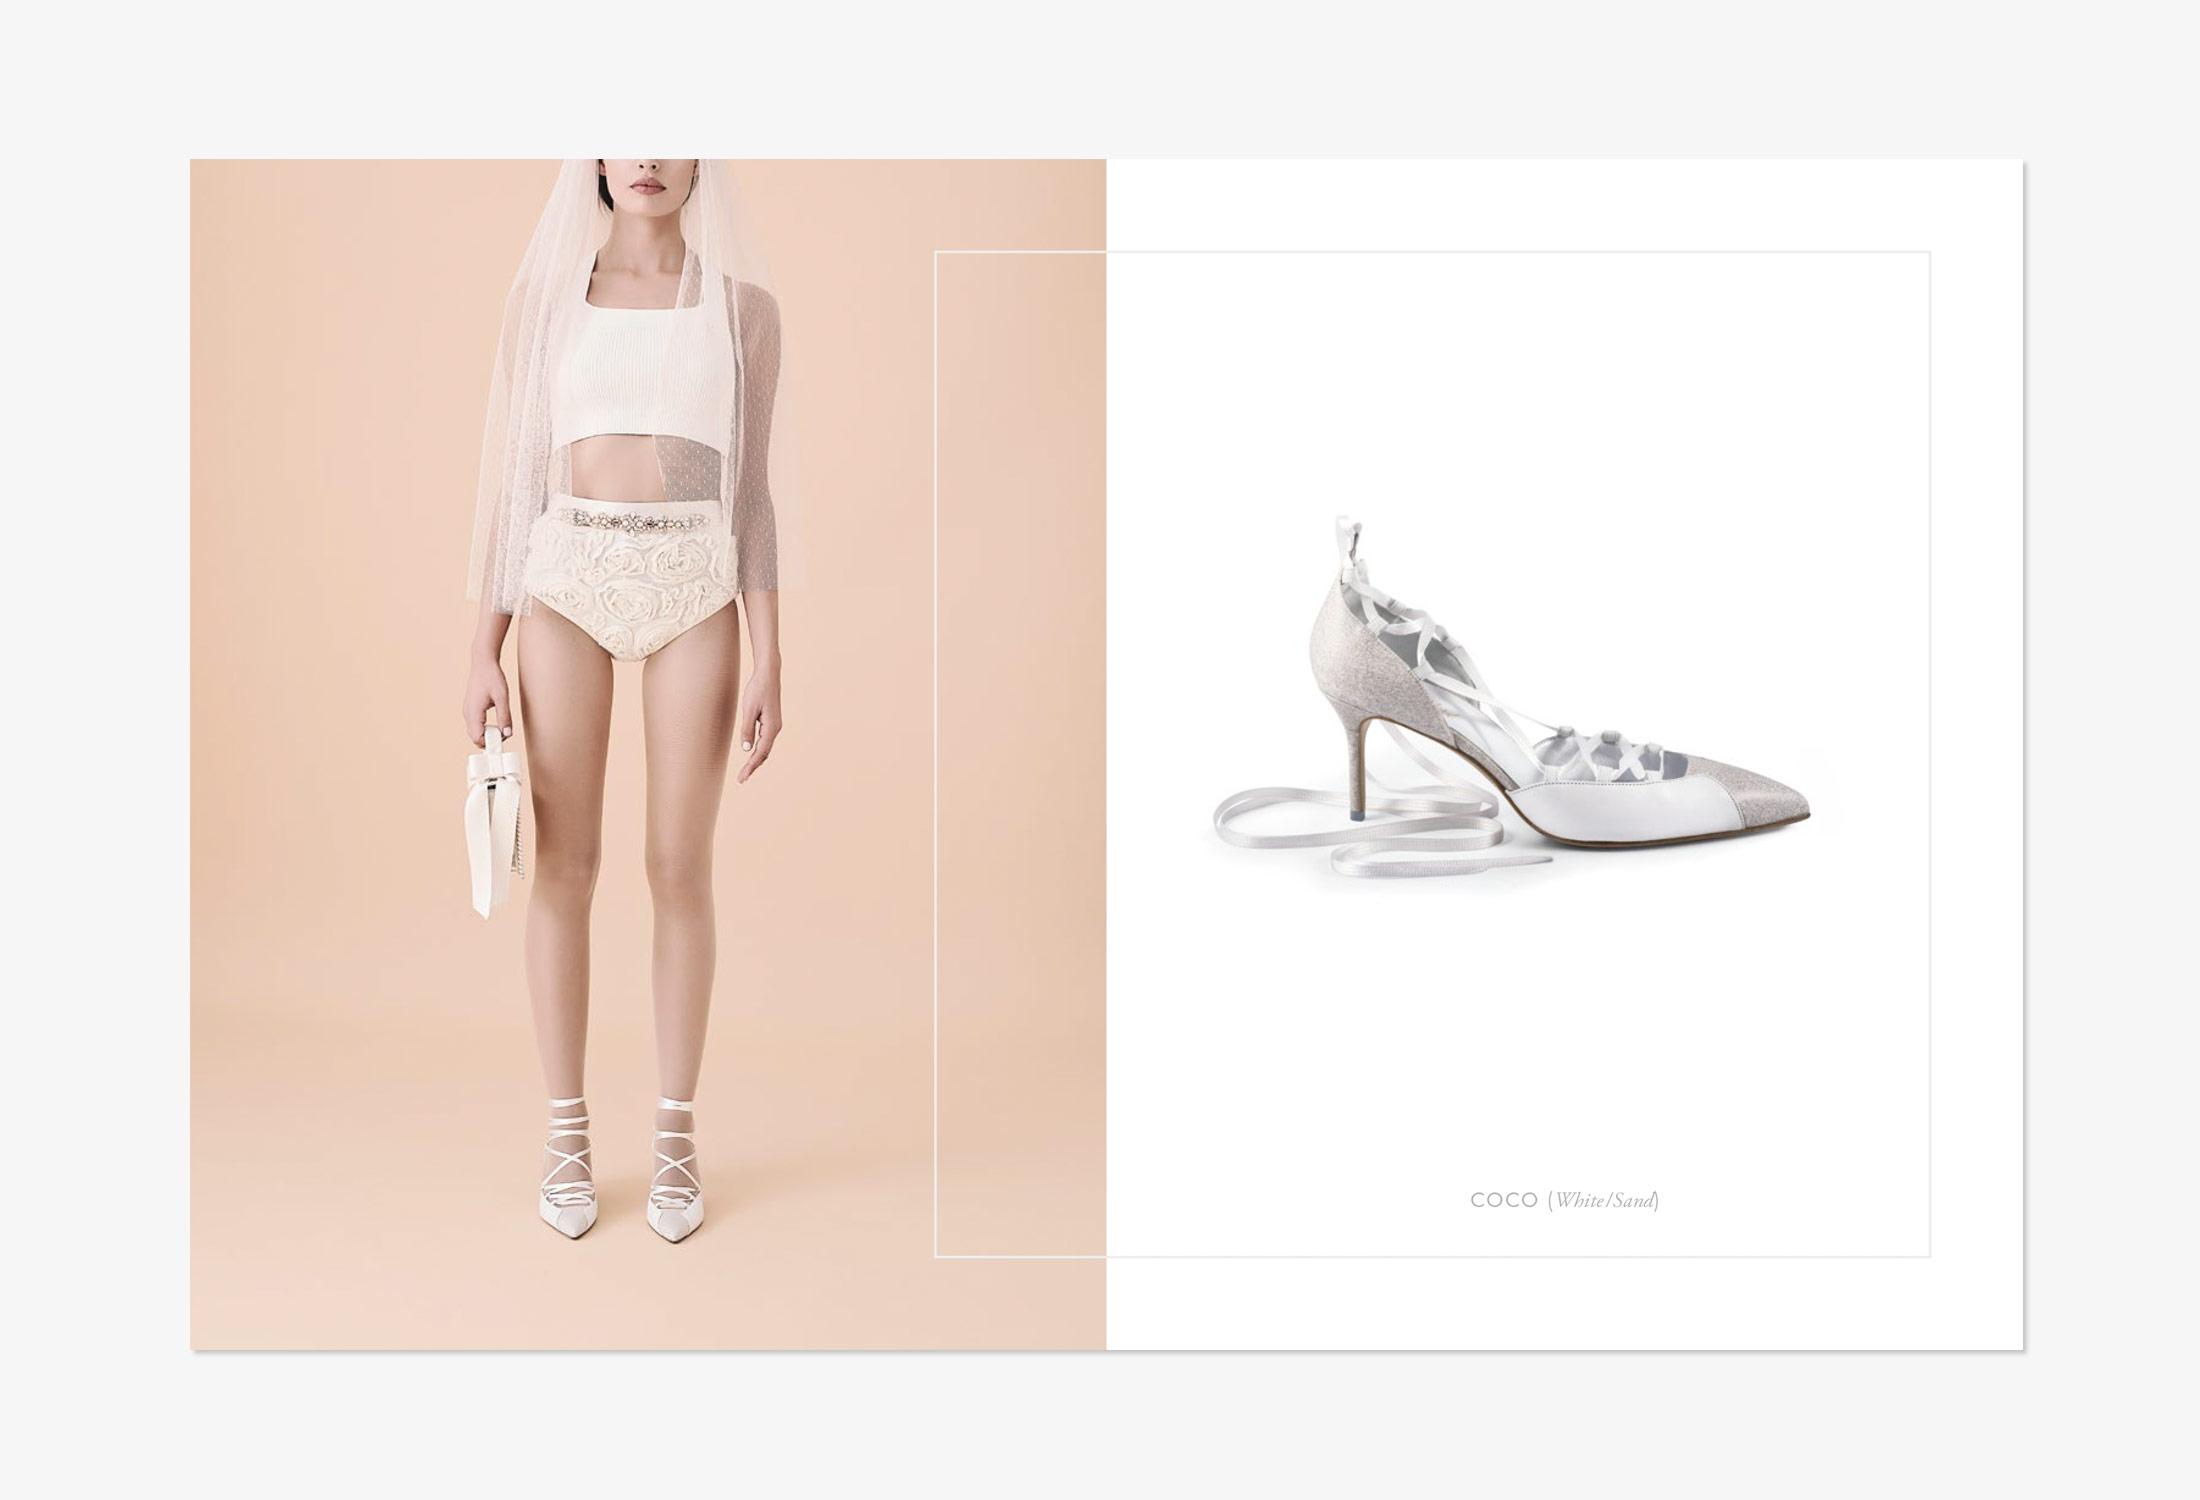 Jessica Bedard 2018 Collection Lookbook